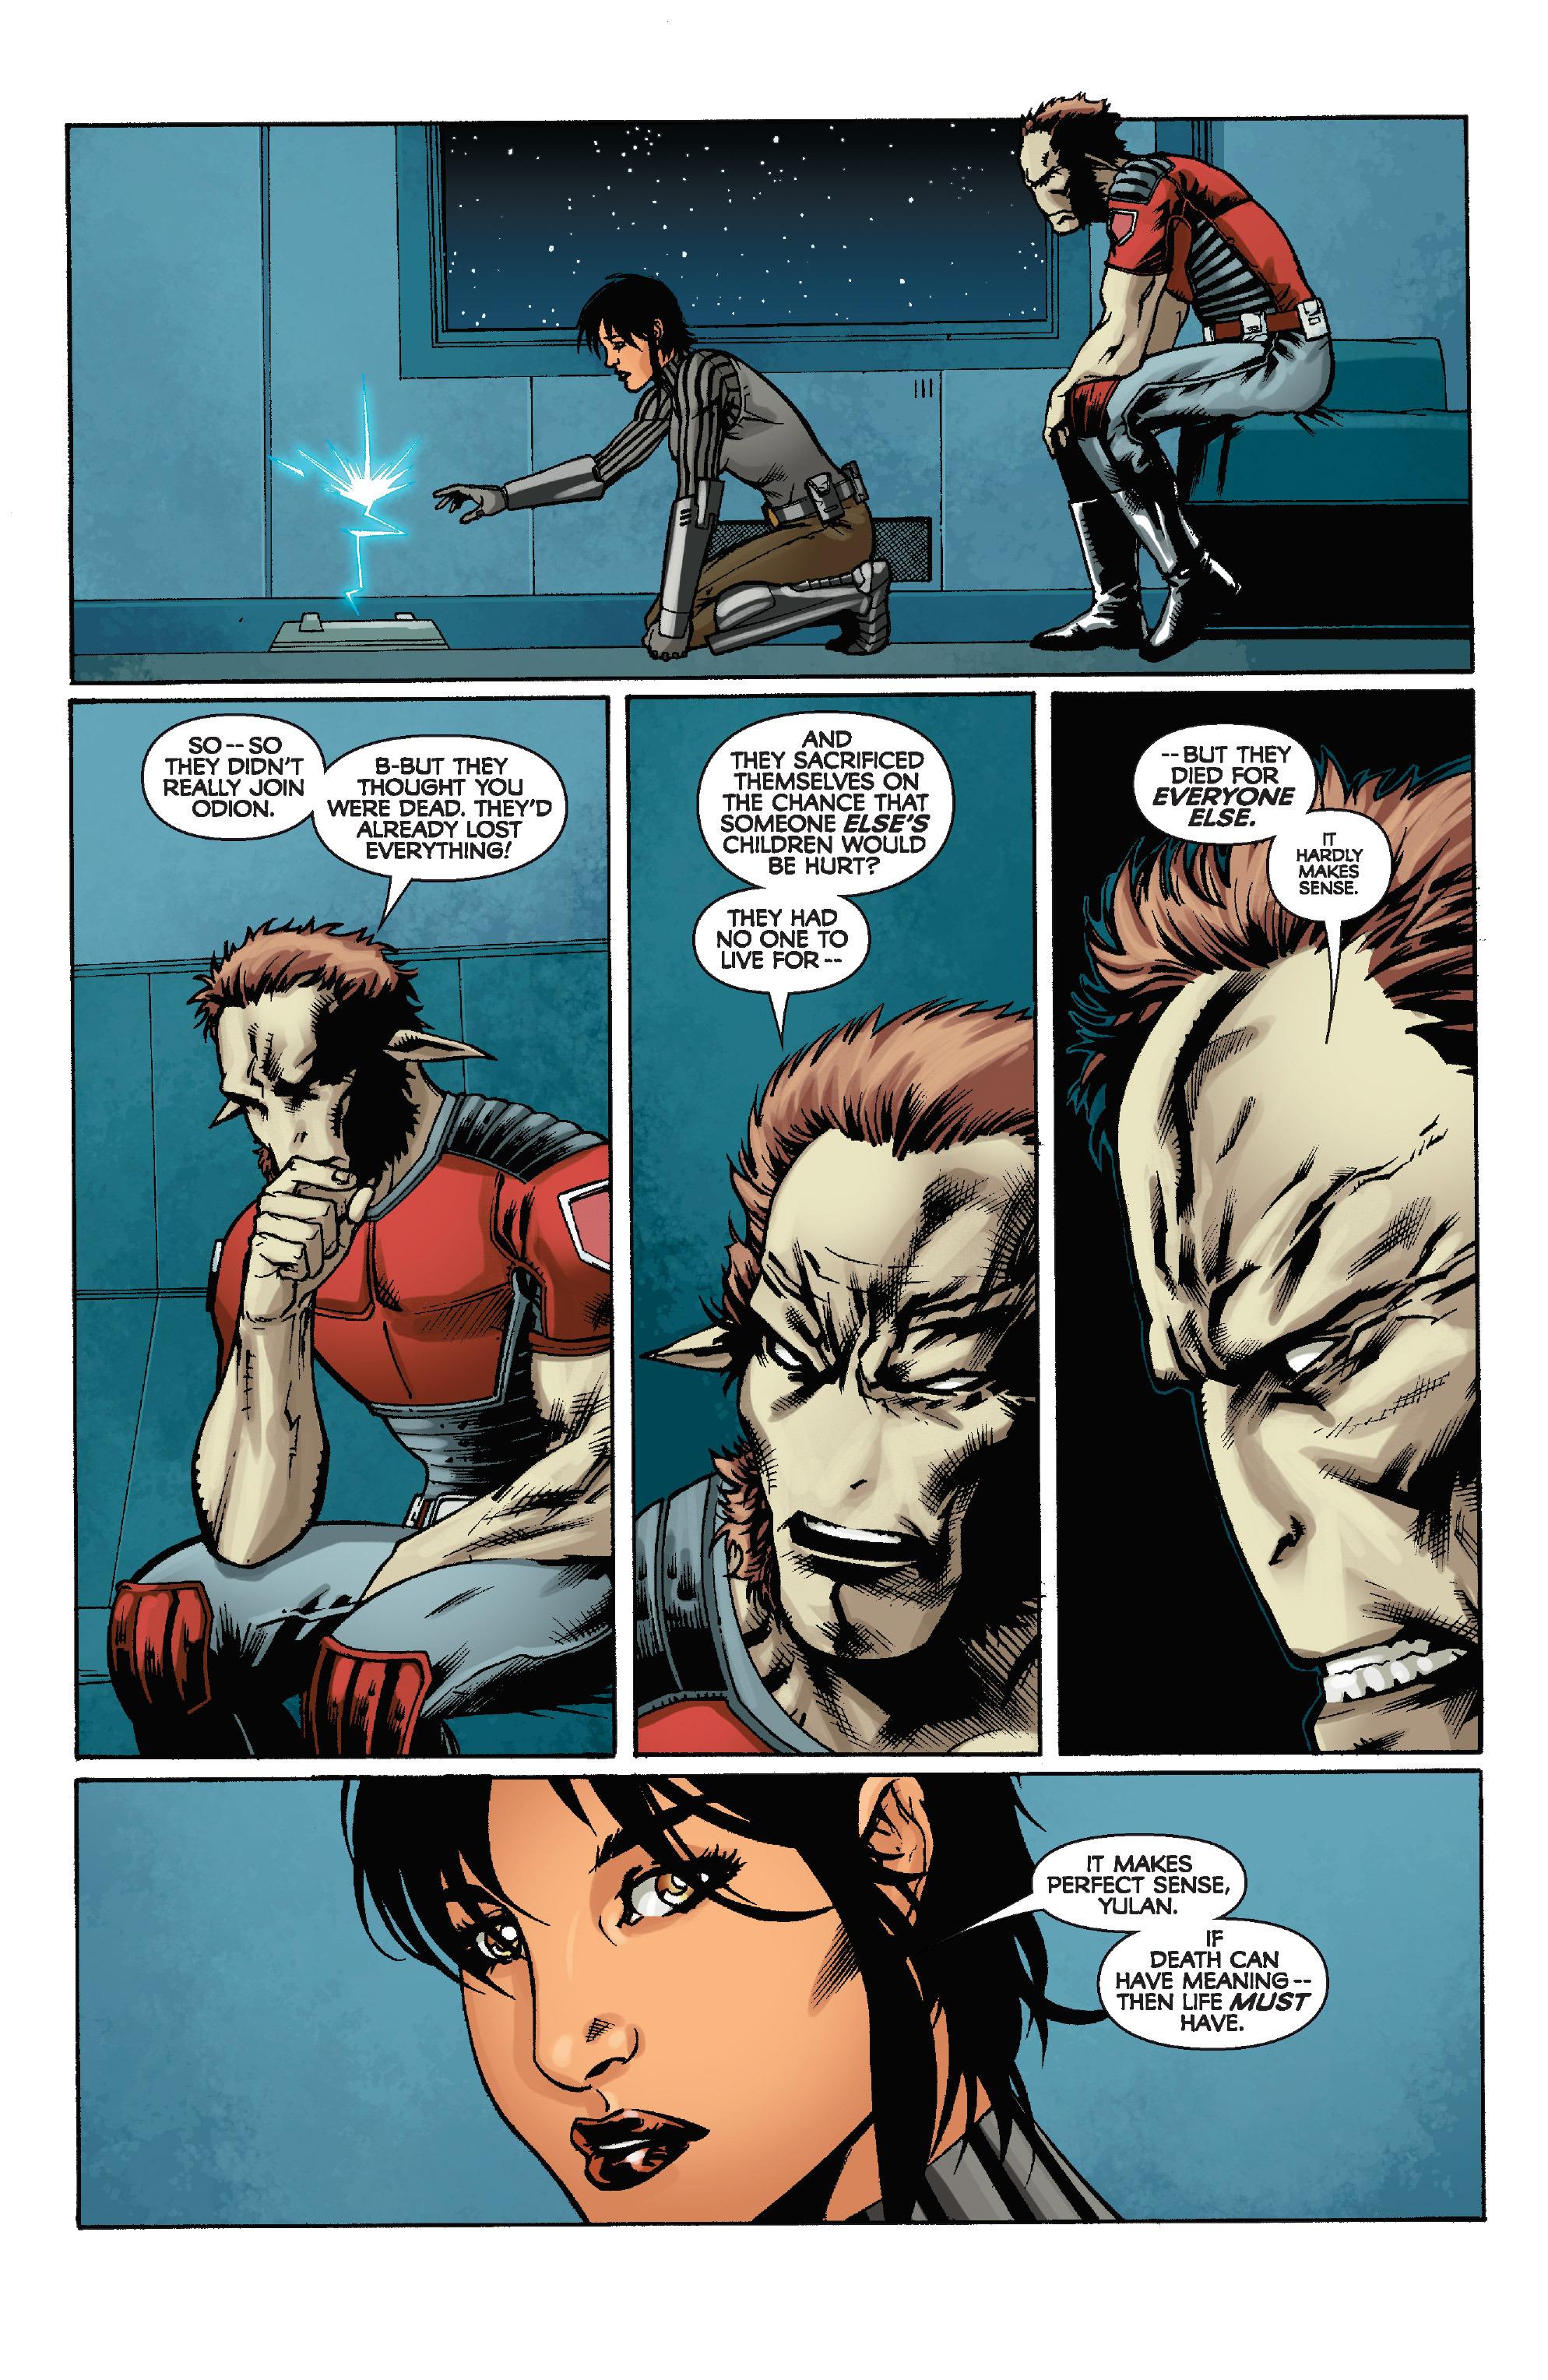 Read online Star Wars: Knight Errant - Escape comic -  Issue #4 - 22